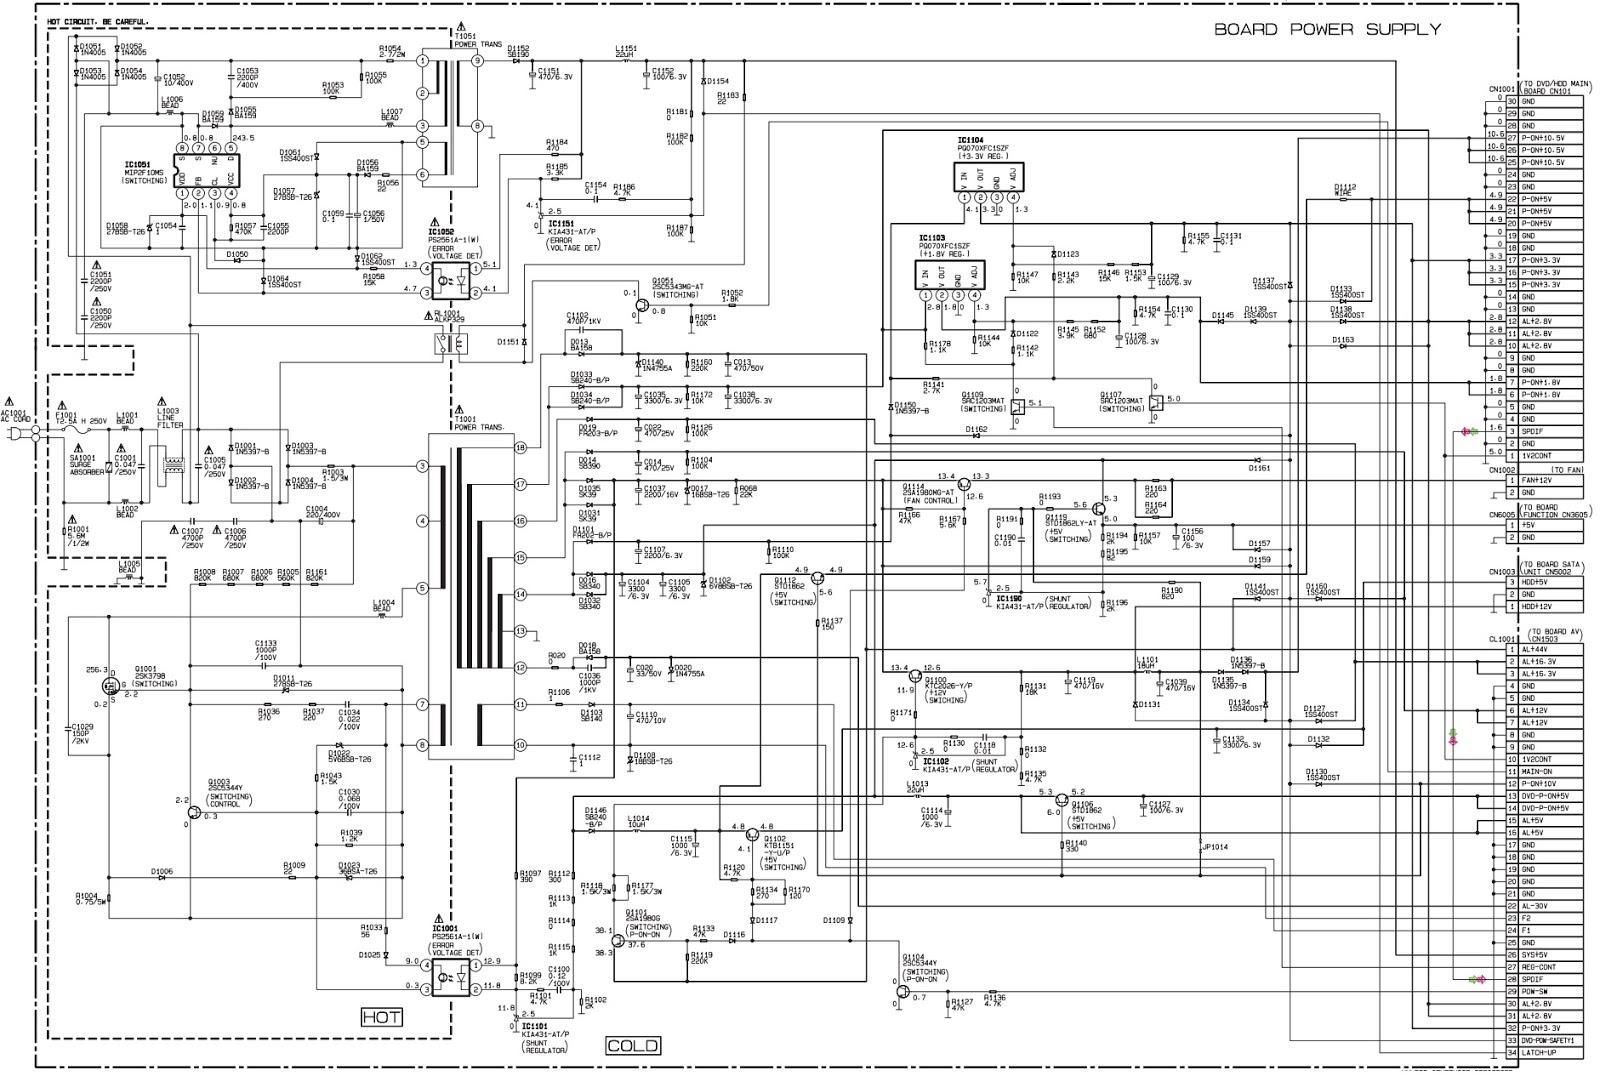 TM 10 3510 220 24 422 as well Mag ic Starters moreover 1 Phase Motor Wiring Diagram besides Split Phase Motor Wiring Diagram Ao Smith likewise Mini Split Condensate Pump Wiring Diagram. on wiring diagrams 115 230 volt diagram 208